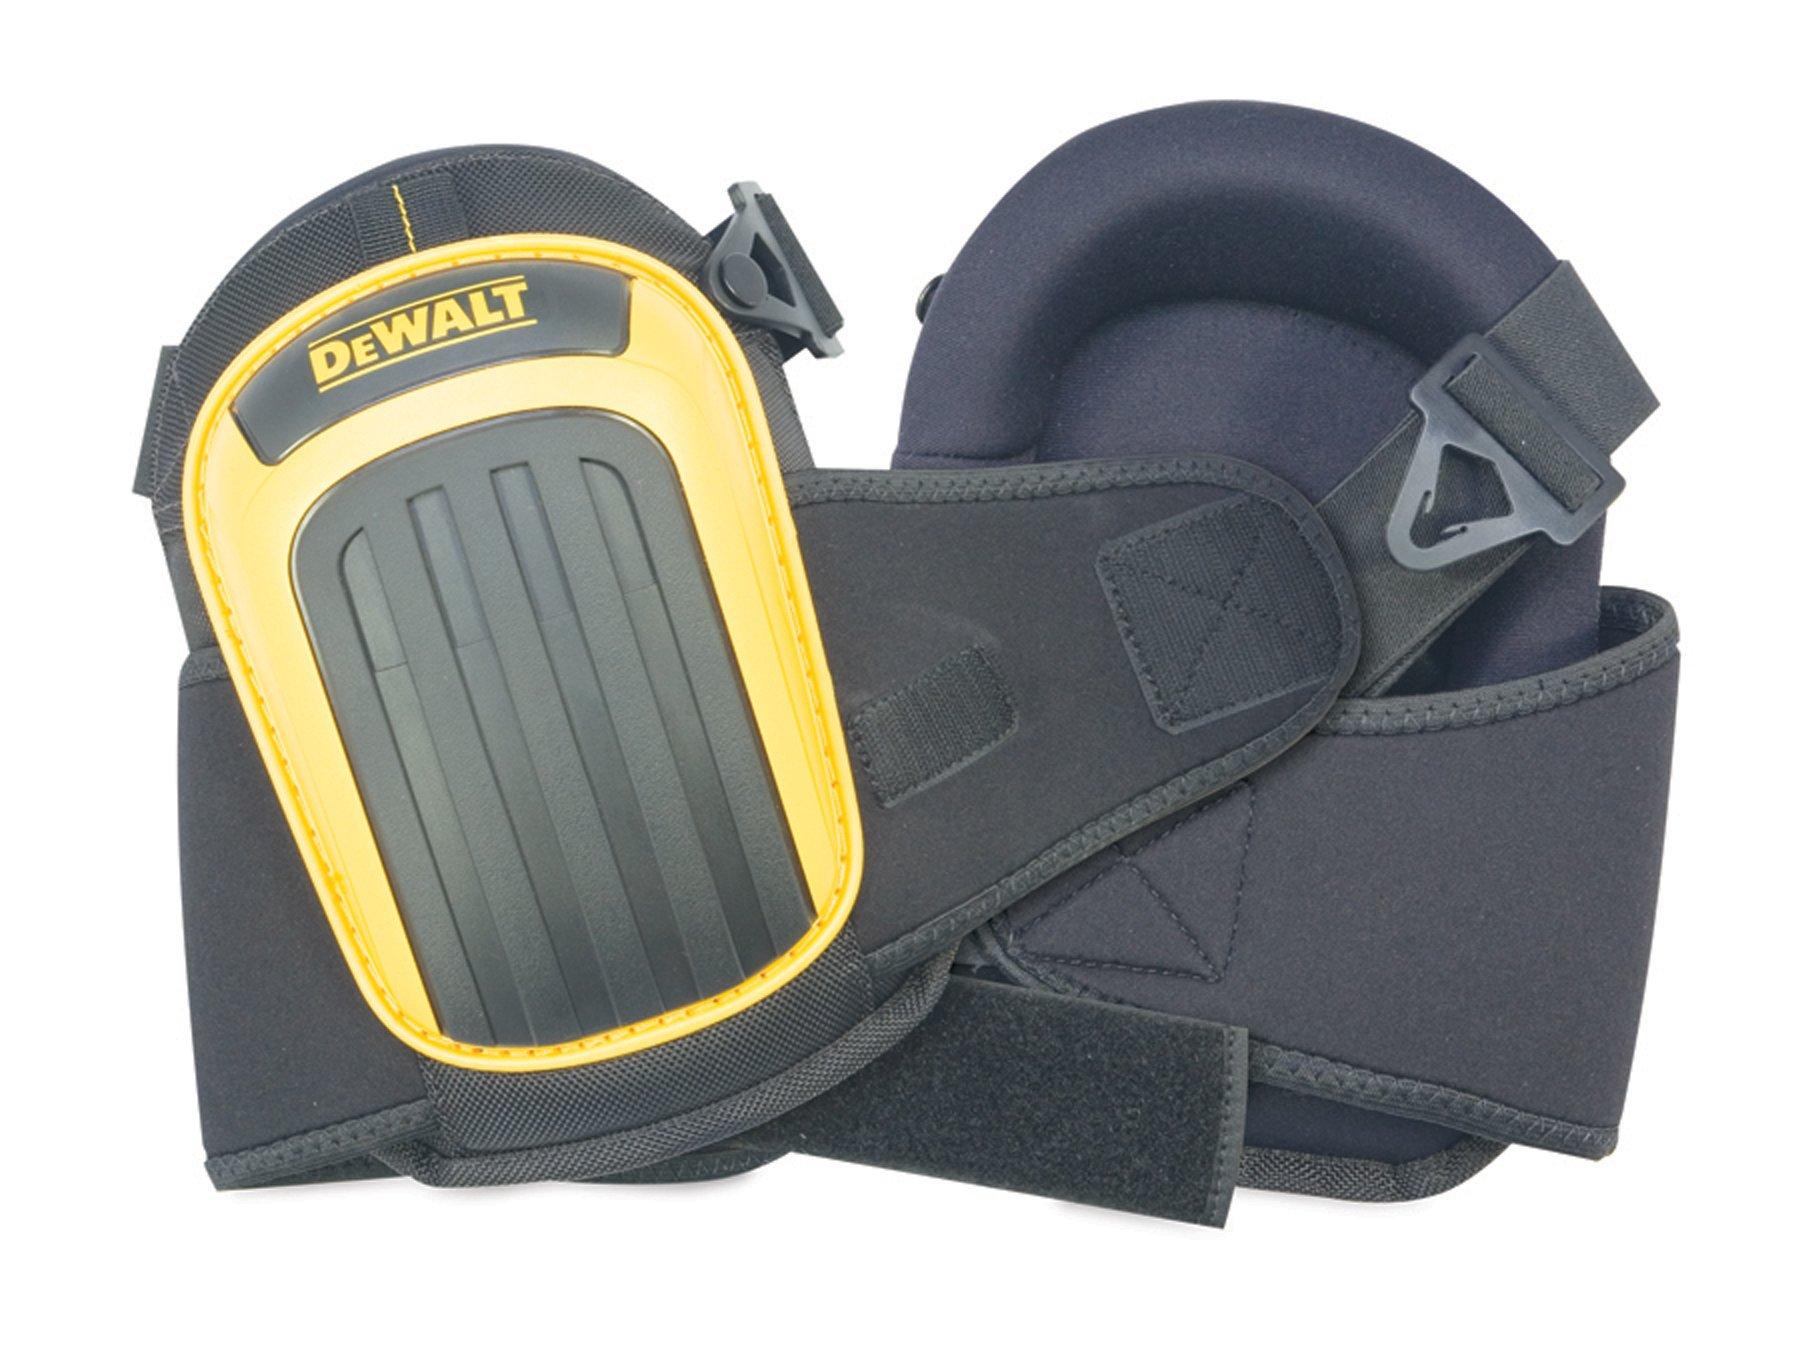 DEWALT DG5204 Professional Kneepads with Layered Gel and Neoprene Fabric Liner by DEWALT